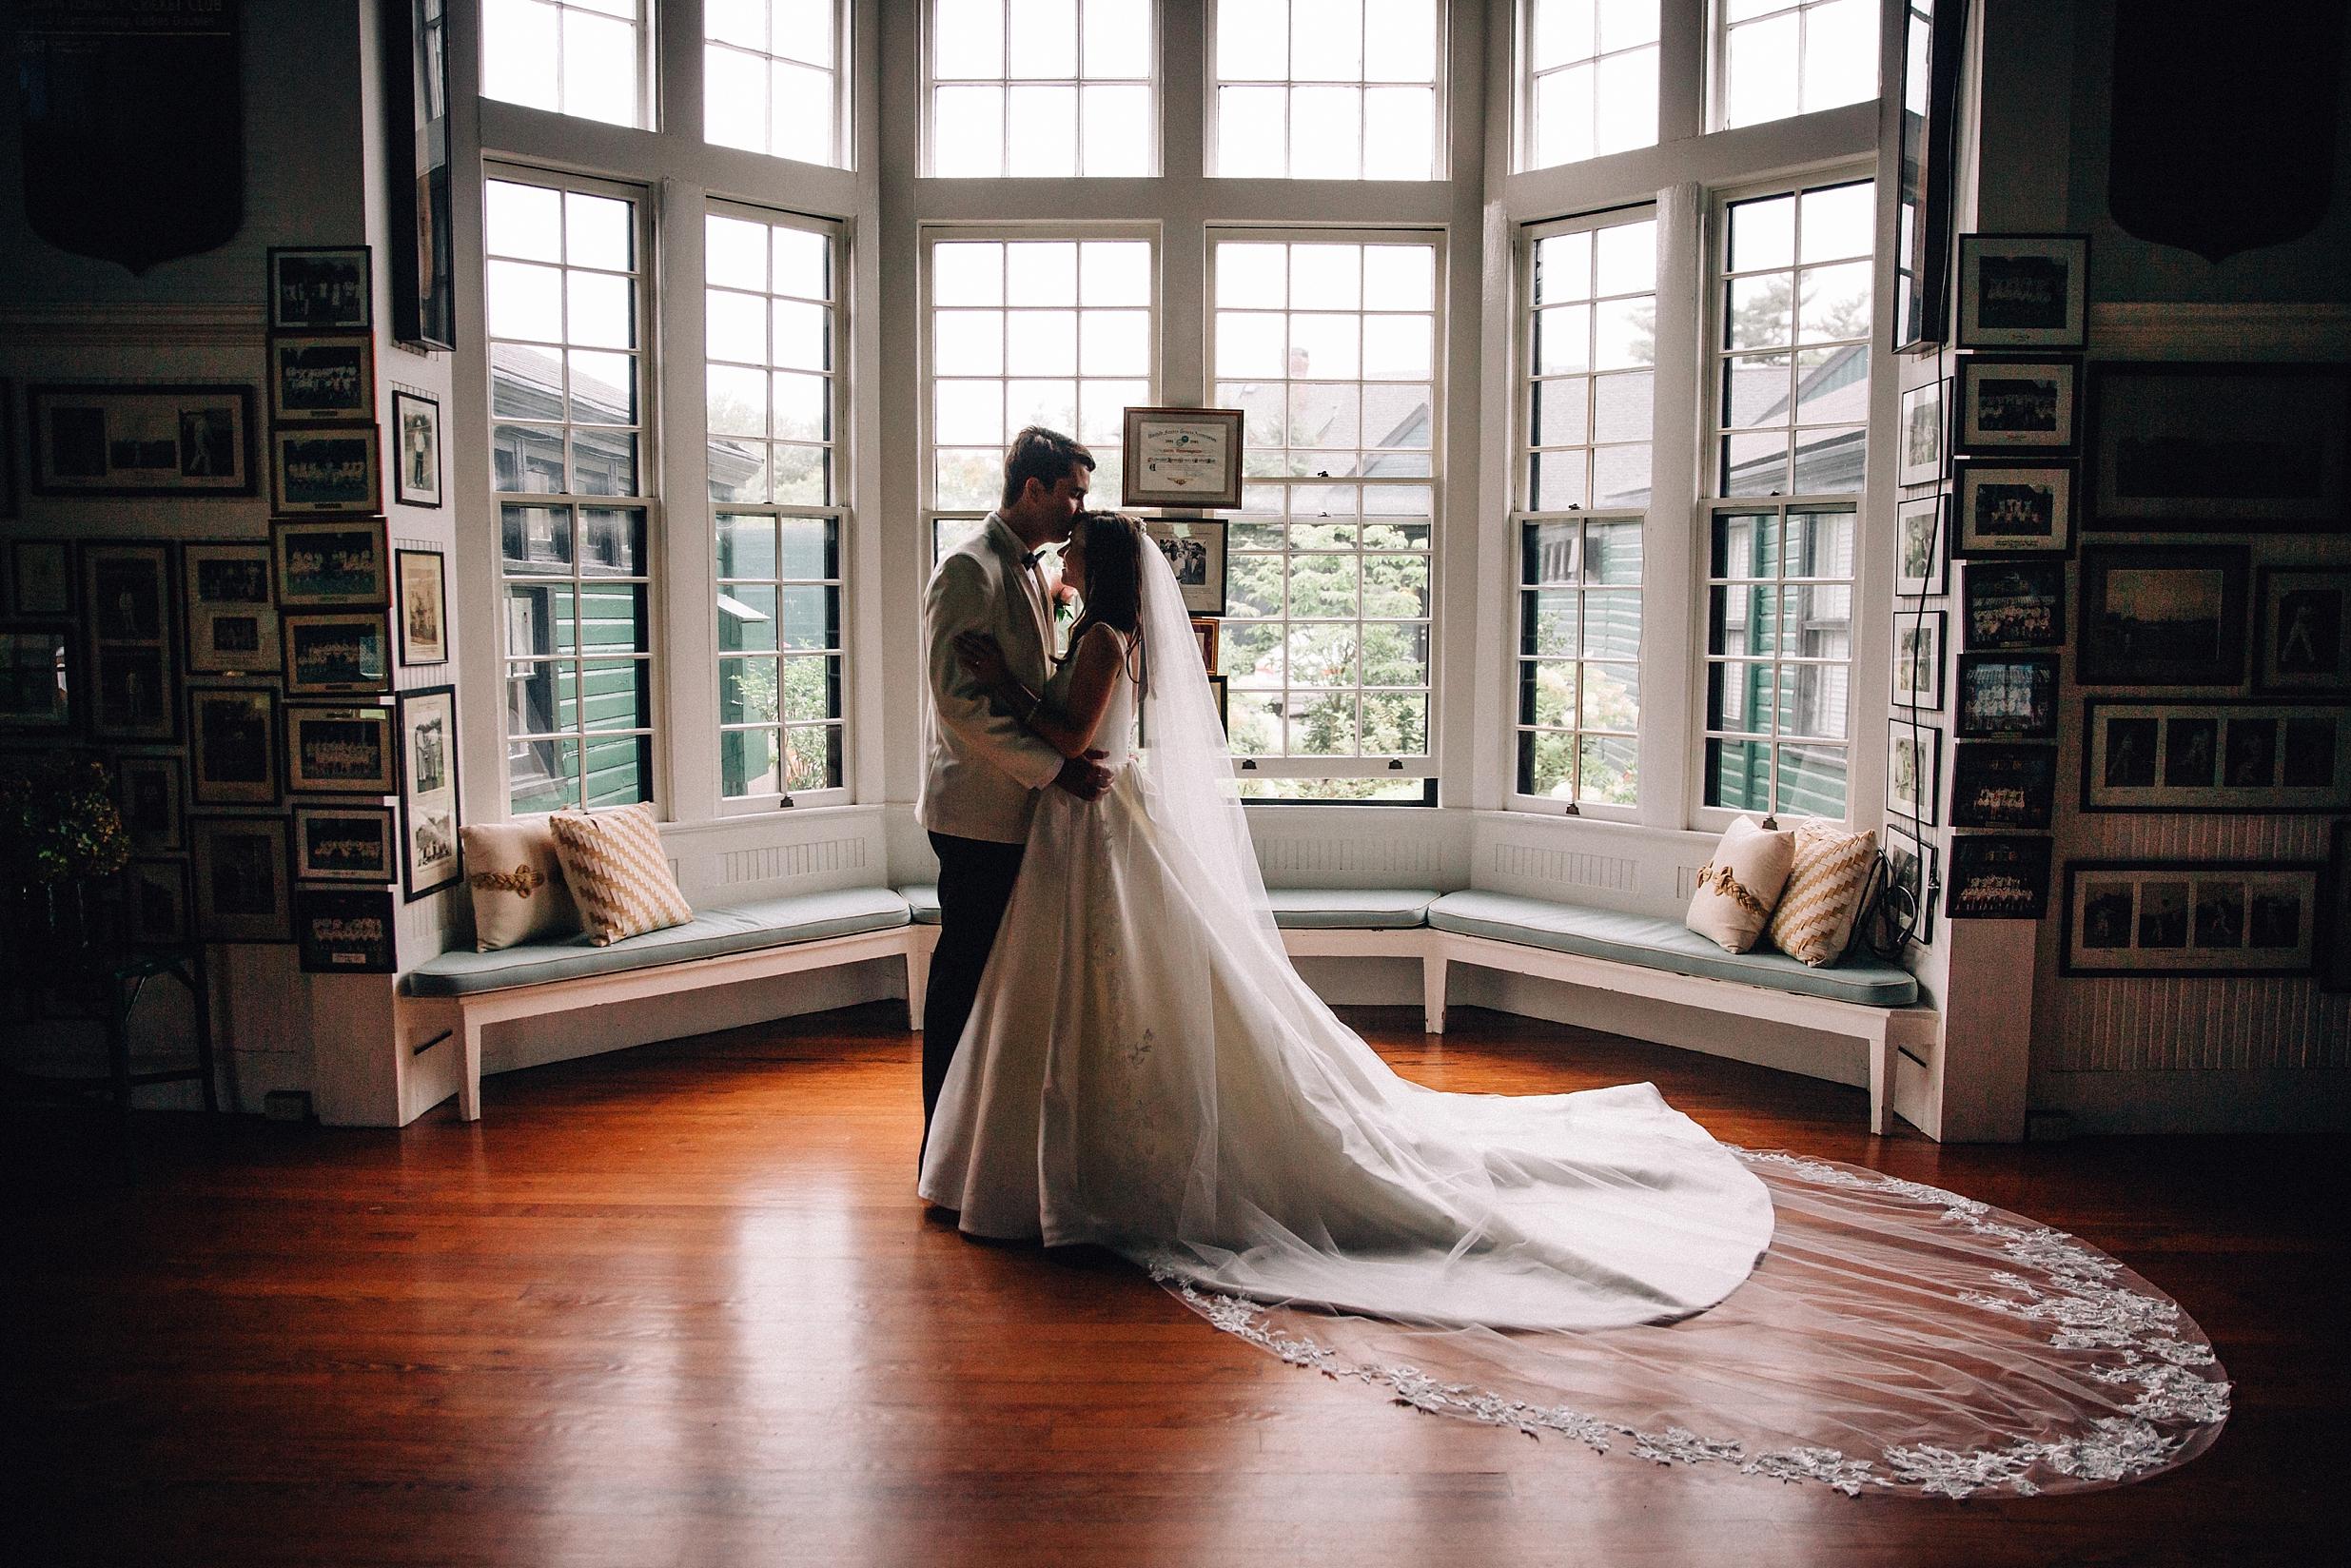 rumson-tented-wedding-nj-maine-conneticut-classic_0025.jpg